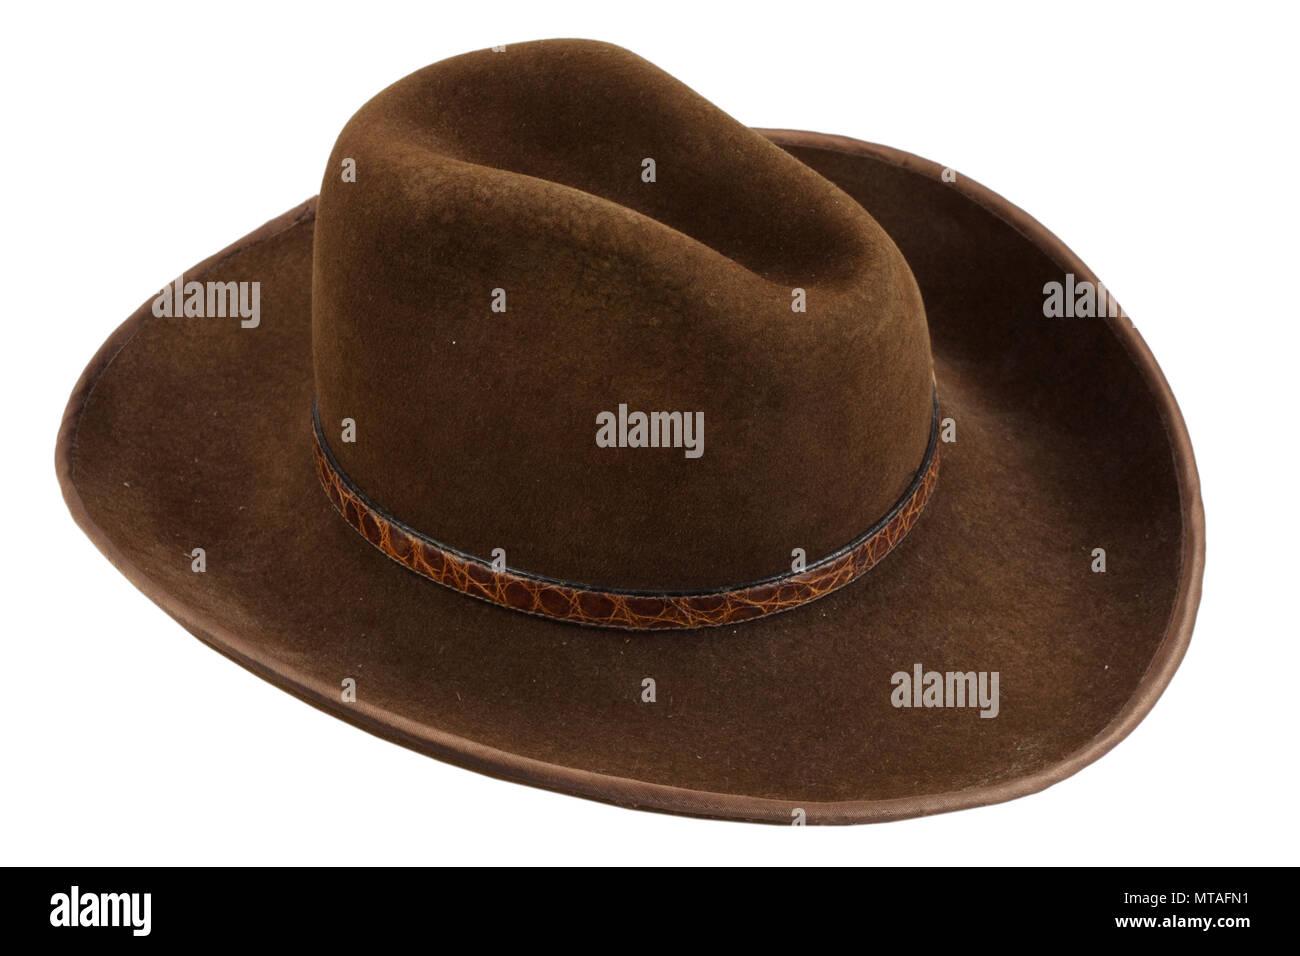 Ranger Hat Imágenes De Stock   Ranger Hat Fotos De Stock - Alamy 4eeae58606a